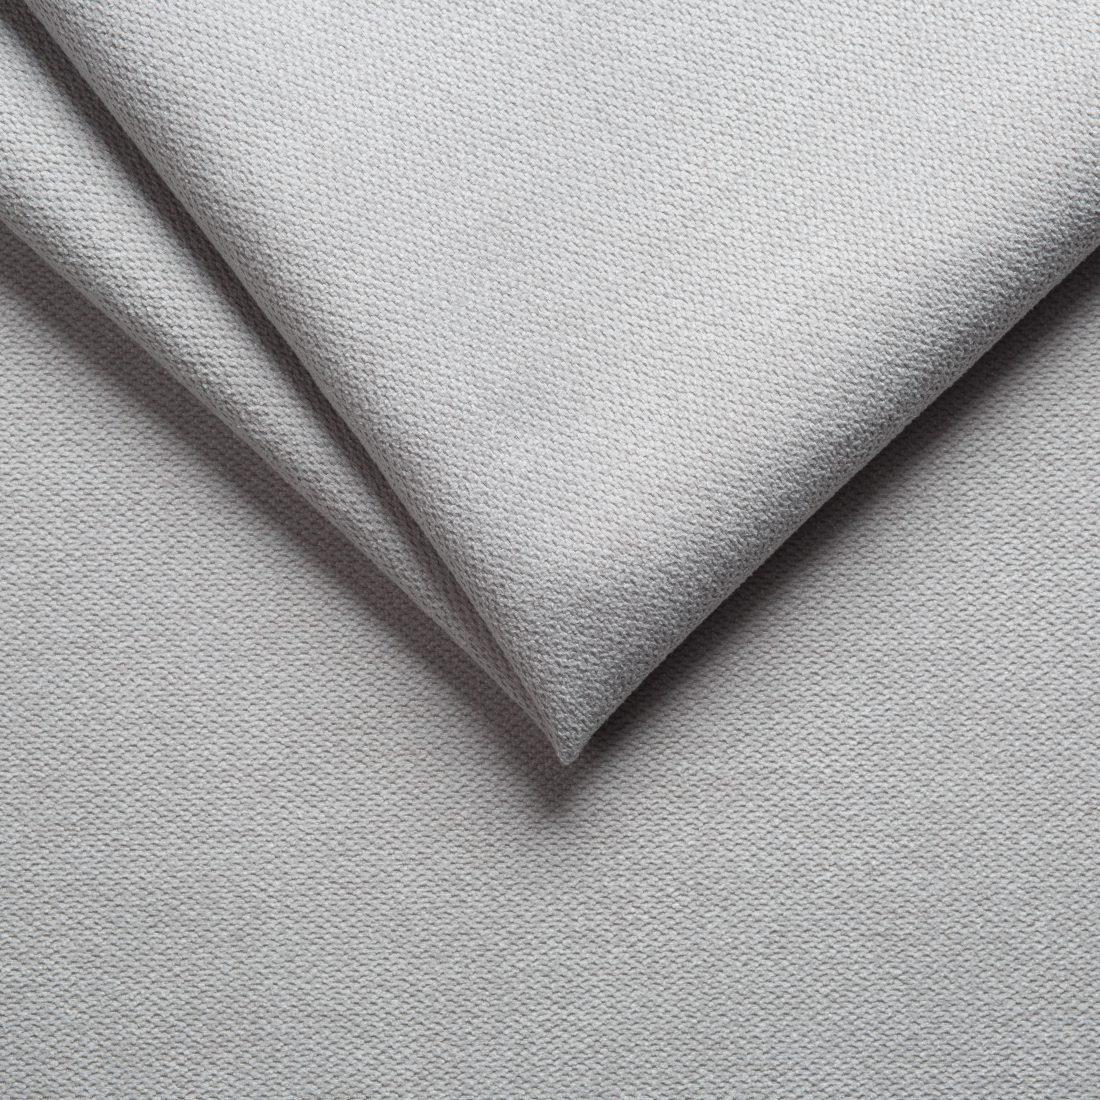 Мебельная ткань Enjoy 20 Silver, микрофибра